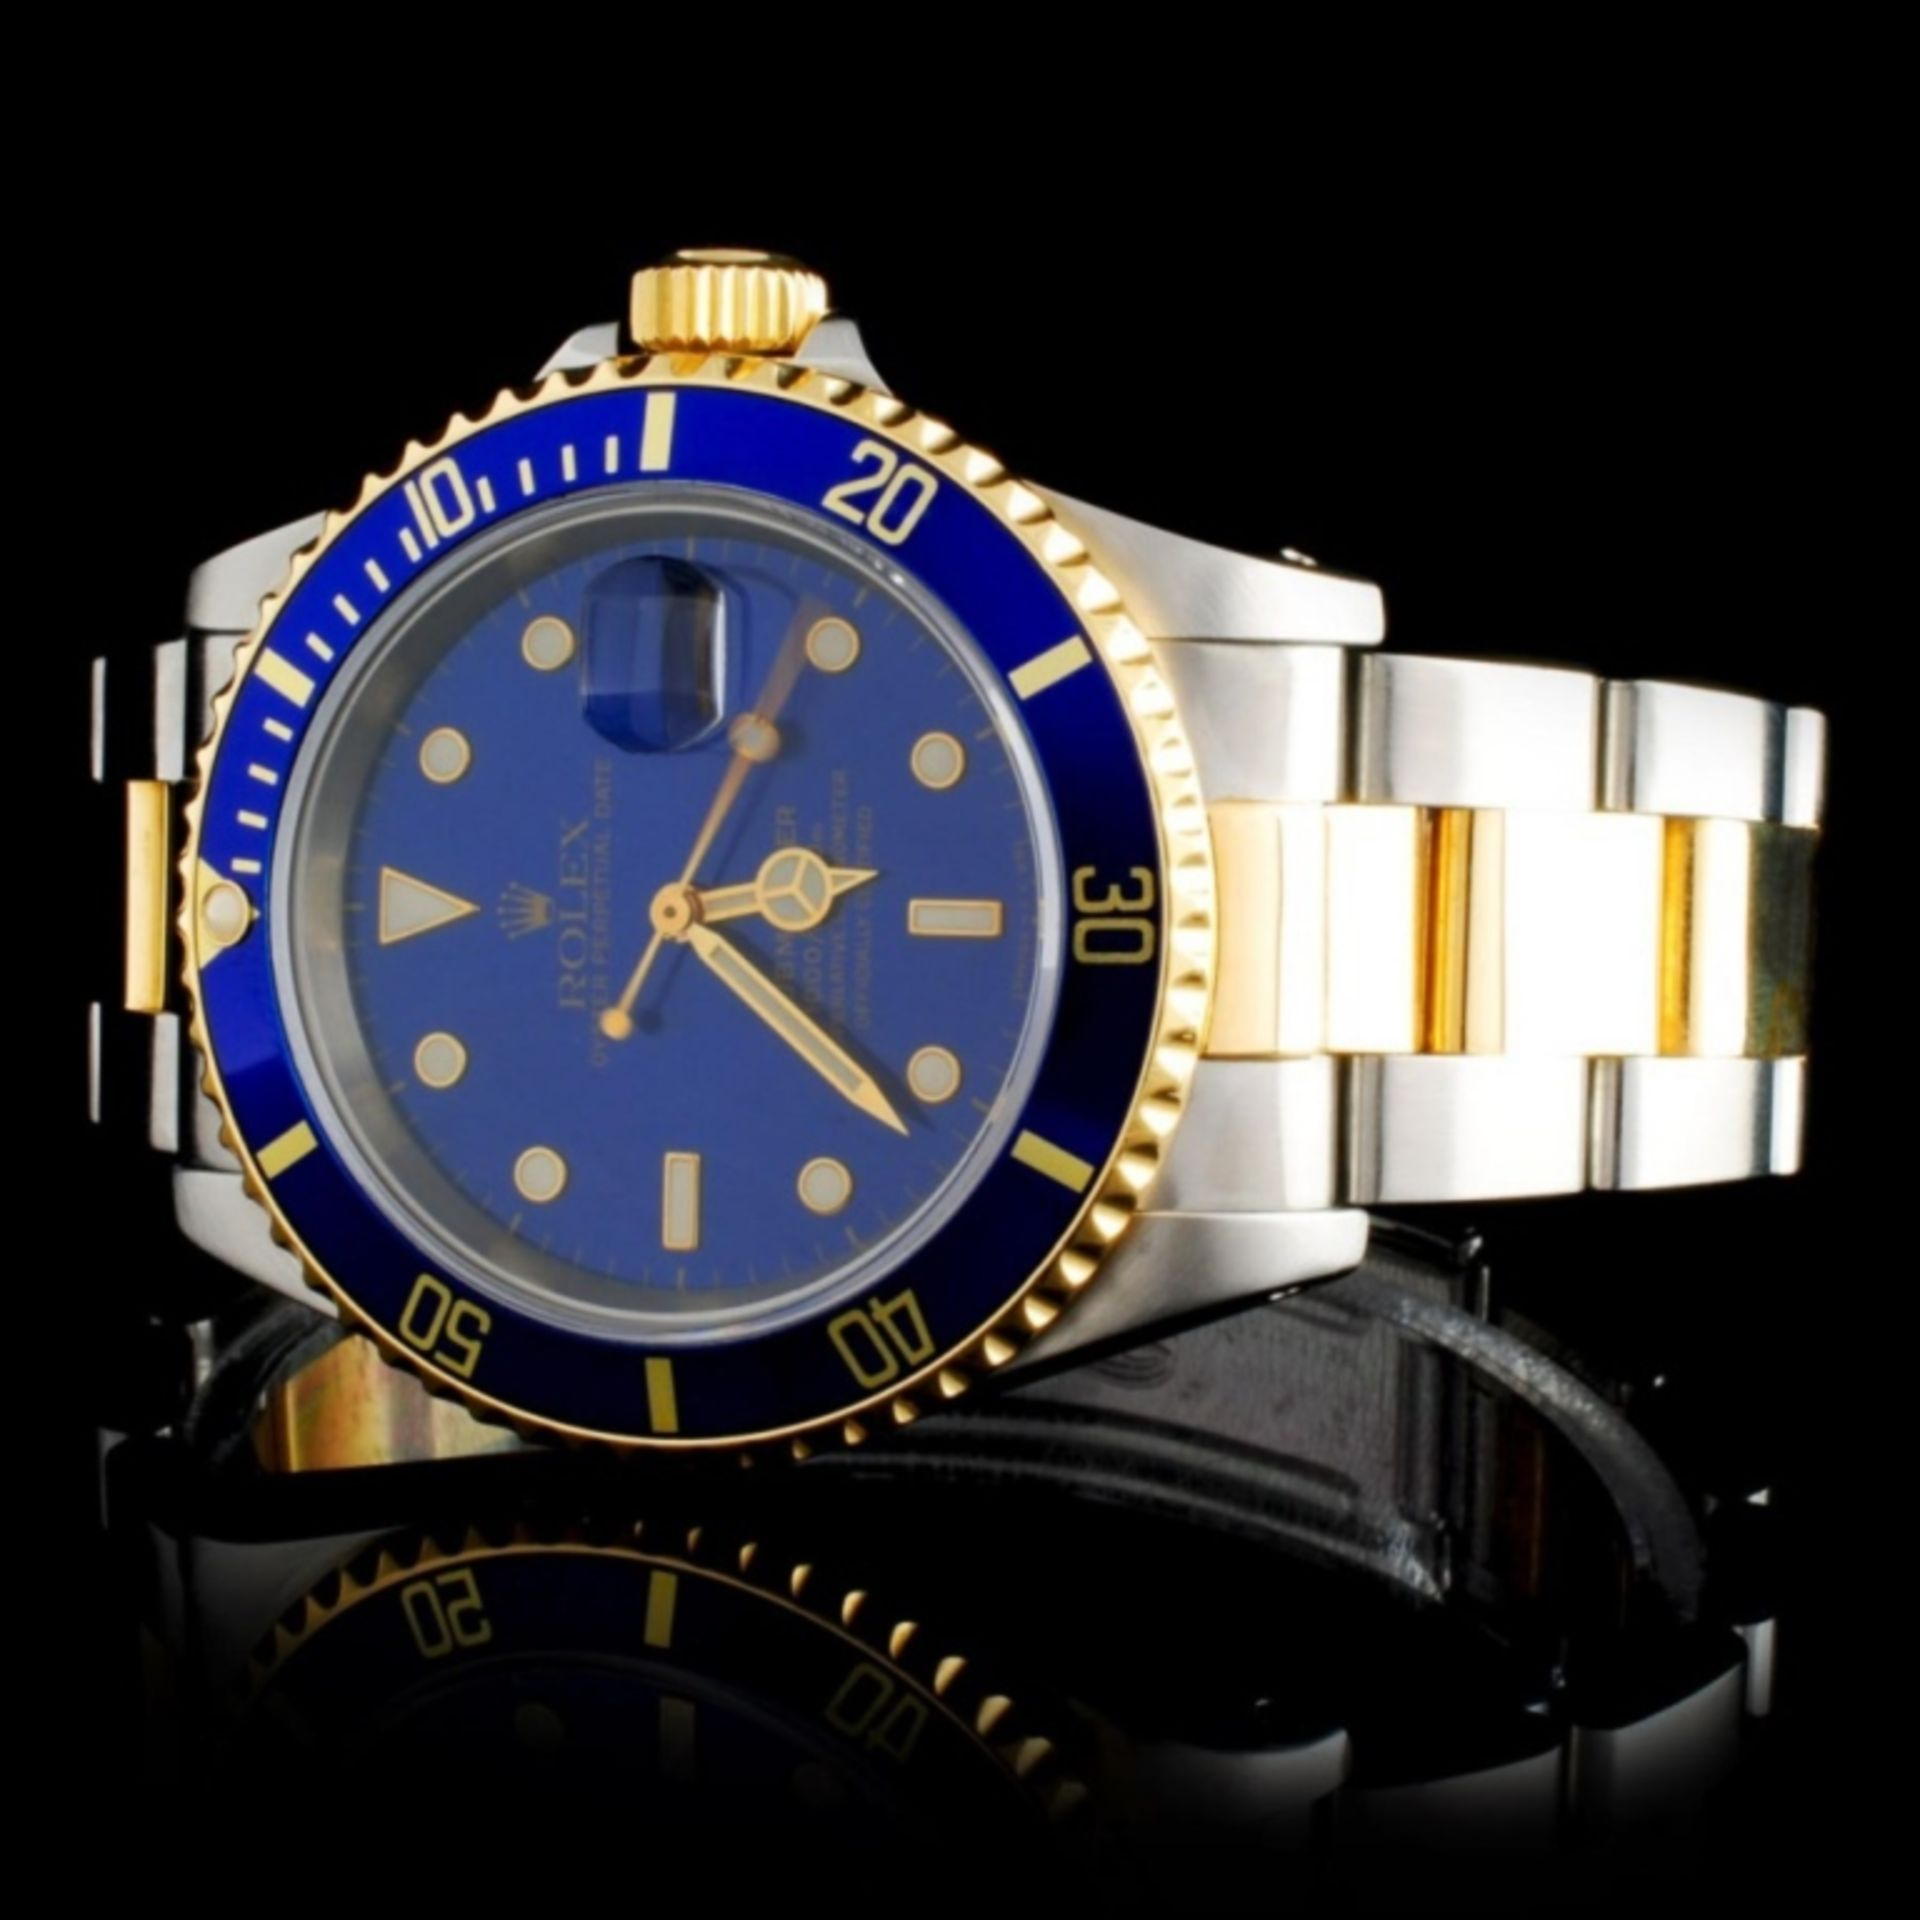 Rolex YG/SS Submariner 40MM Wristwatch - Image 2 of 5